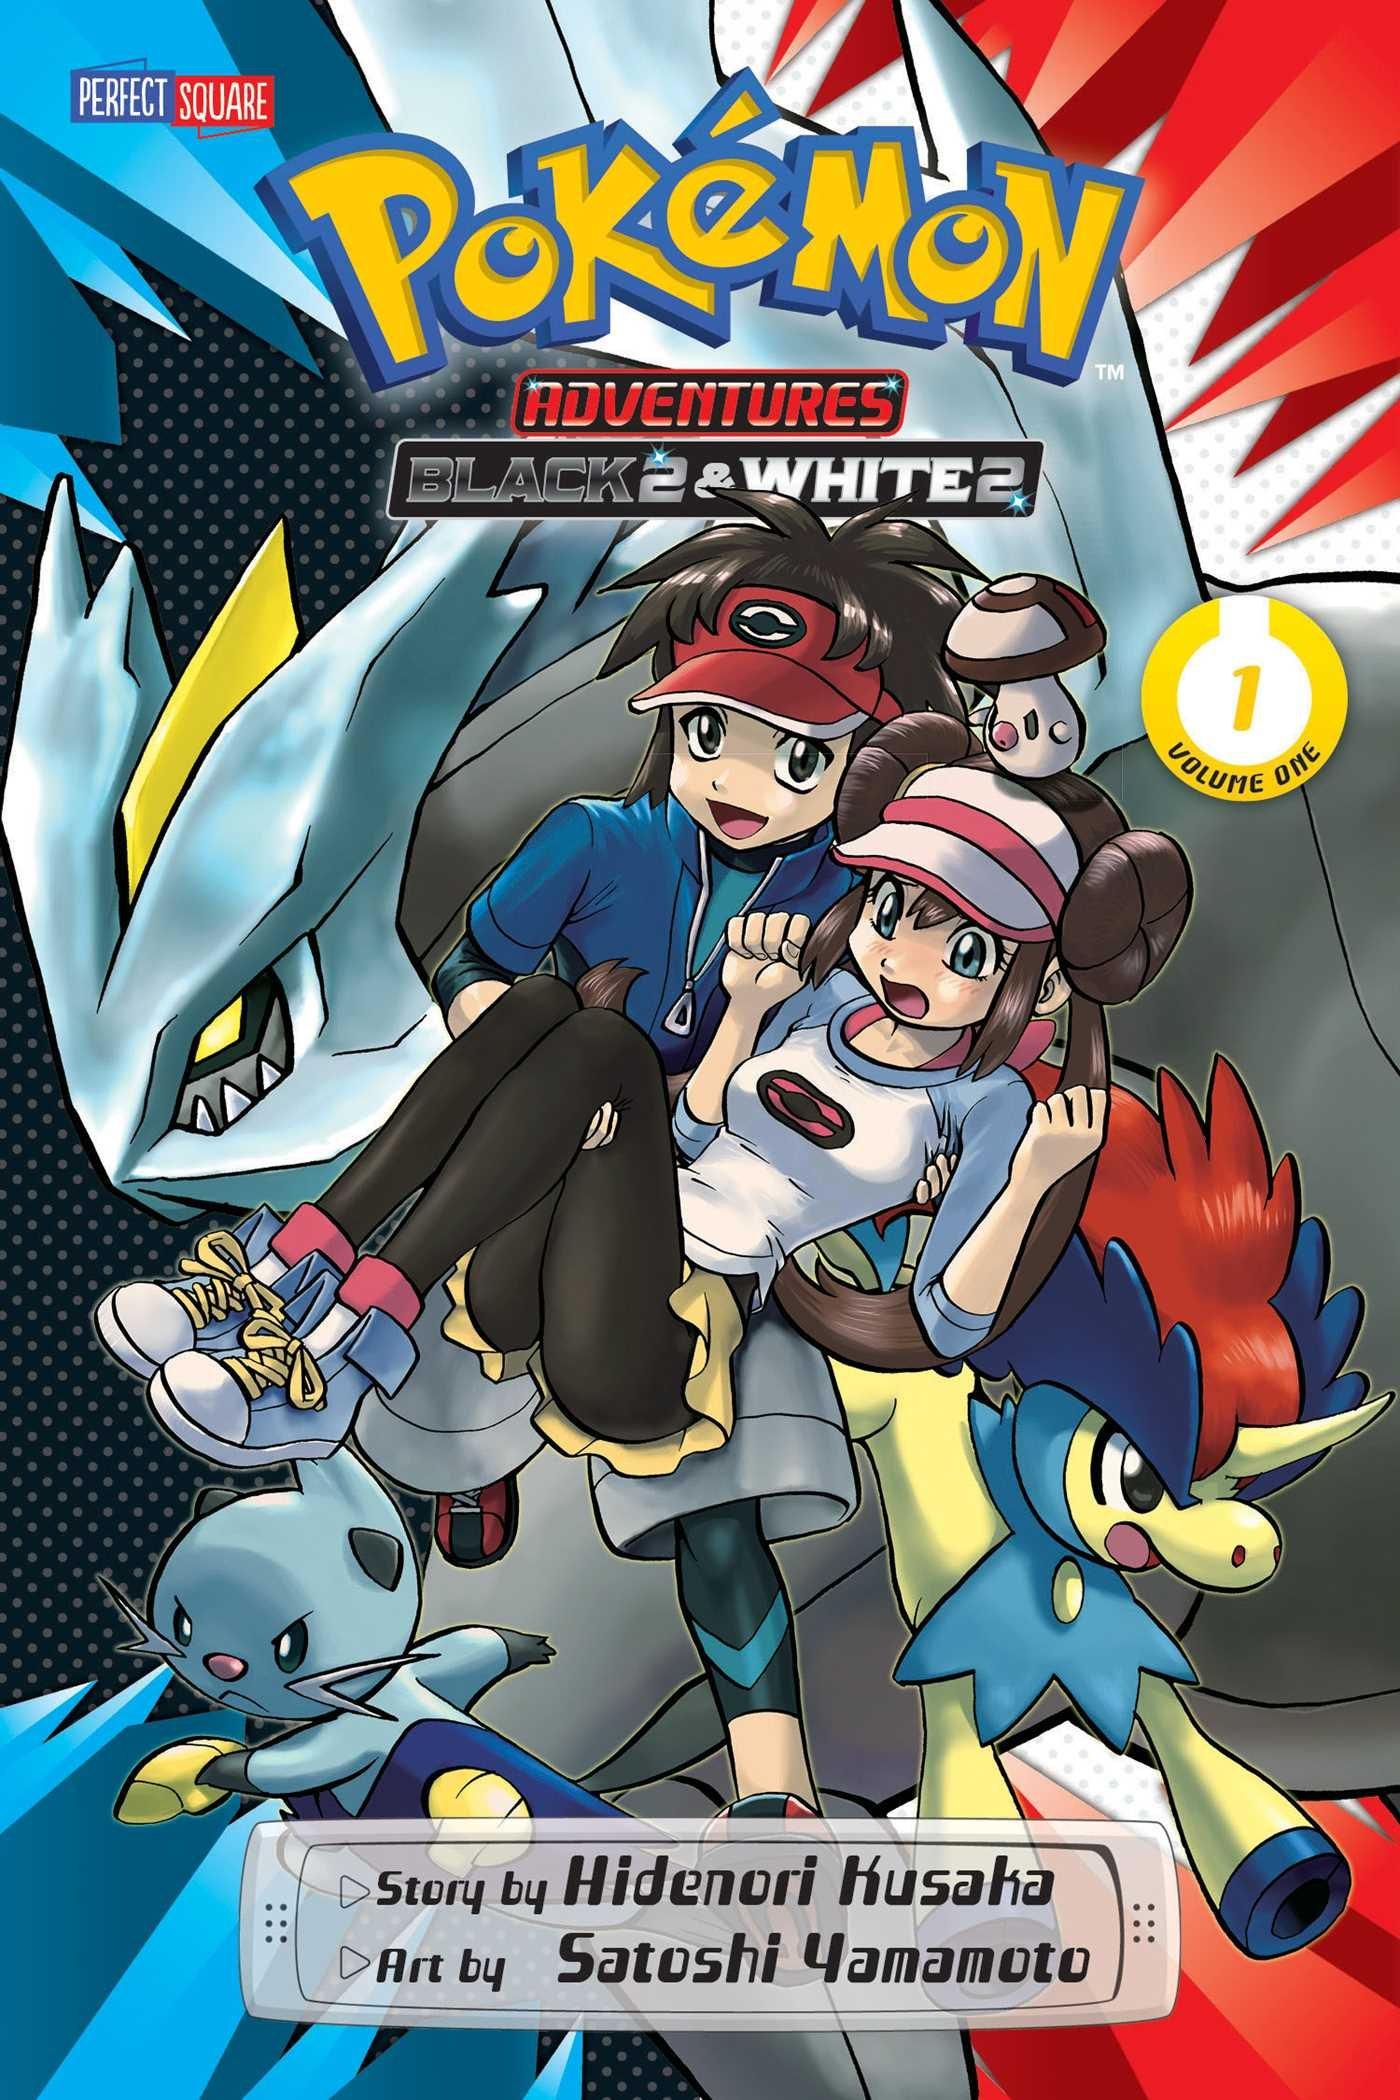 Amazon Com Pokemon Adventures Black 2 White 2 Vol 1 1 9781421584379 Kusaka Hidenori Yamamoto Satoshi Books